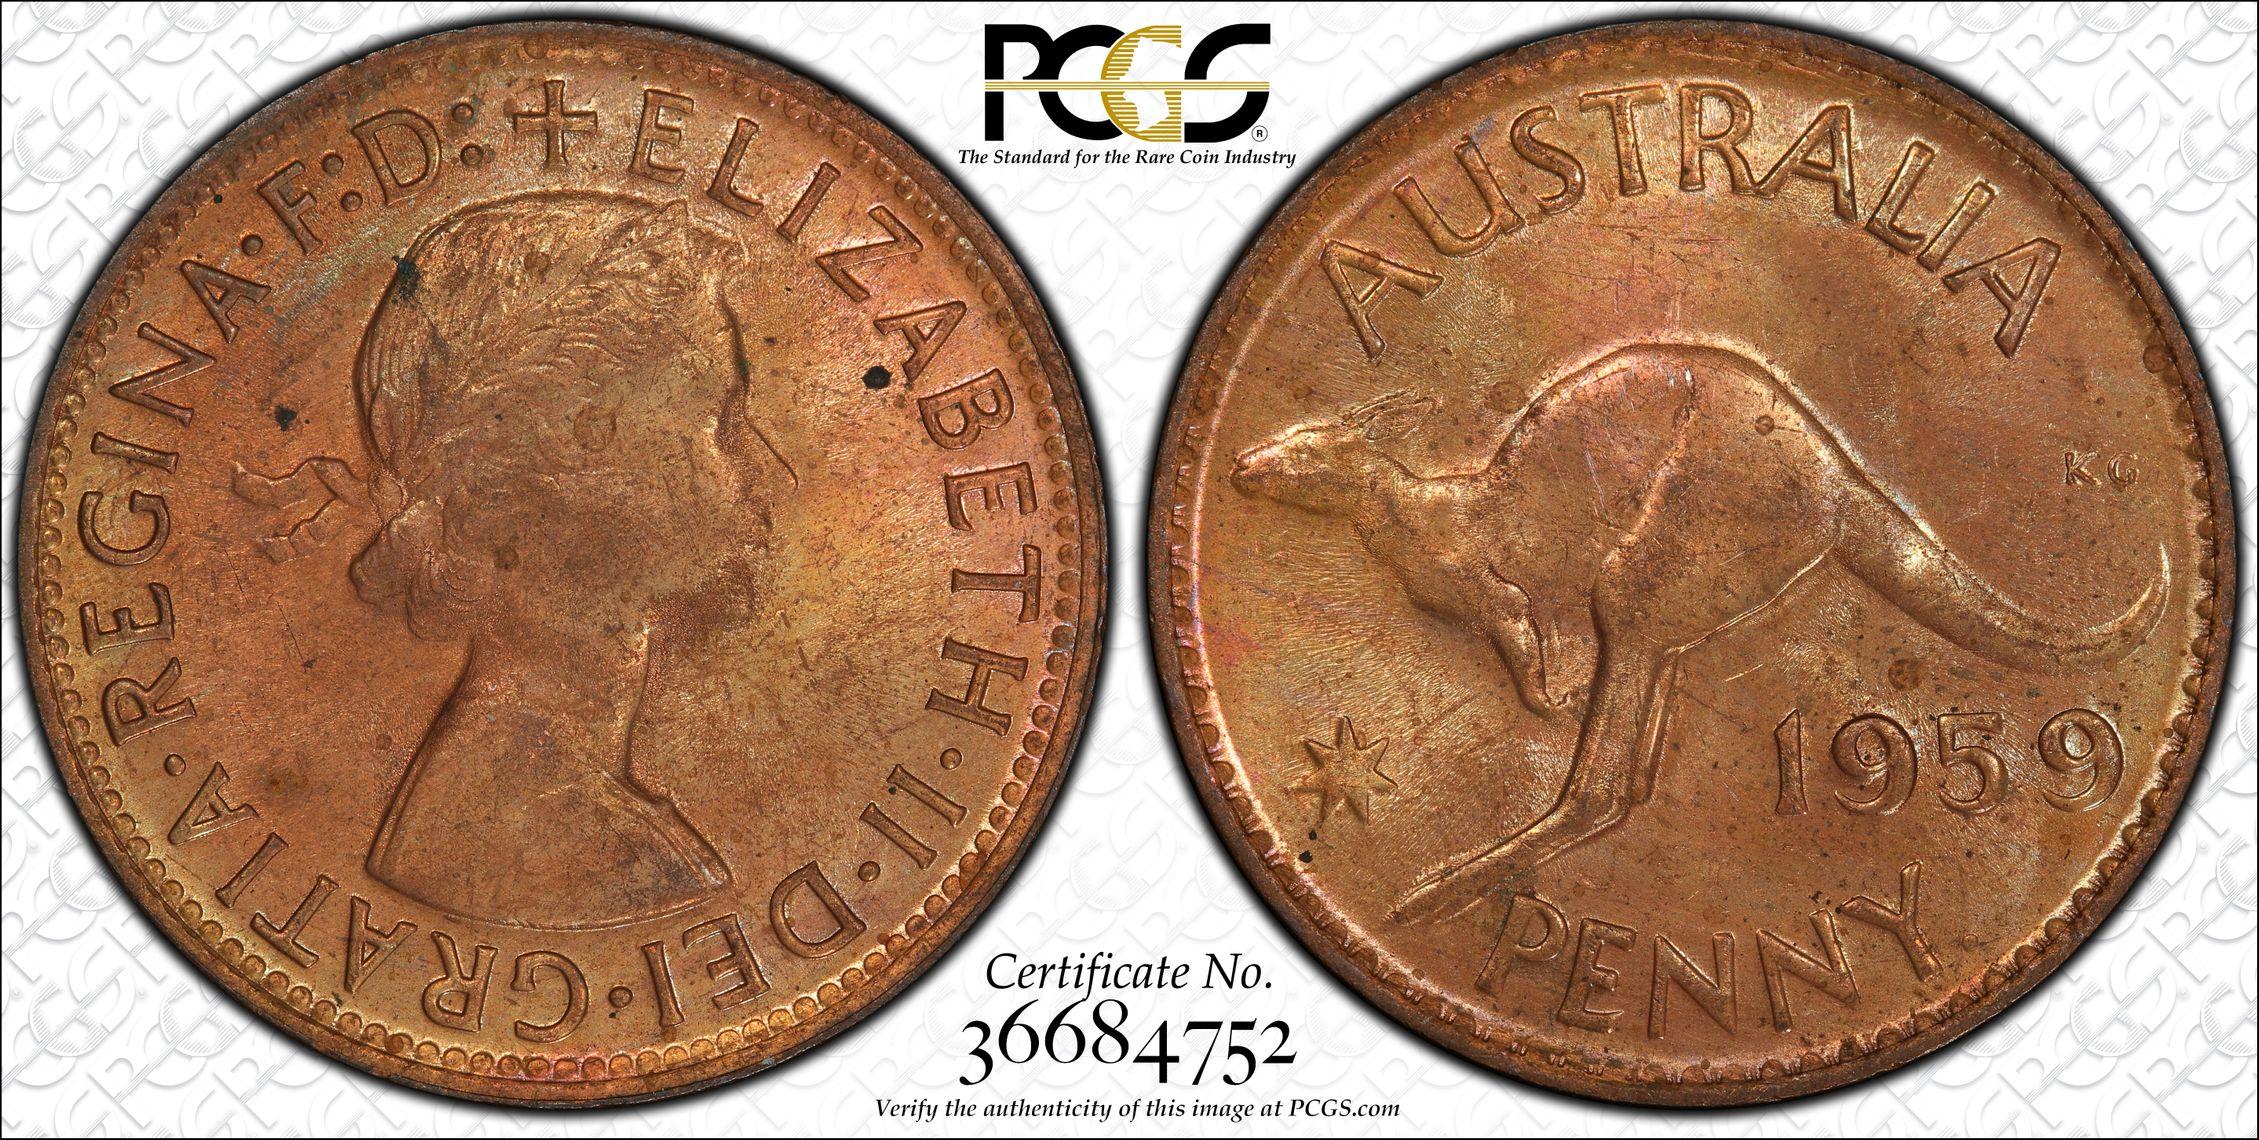 Australia 1959 Perth Penny - PCGS MS63RB